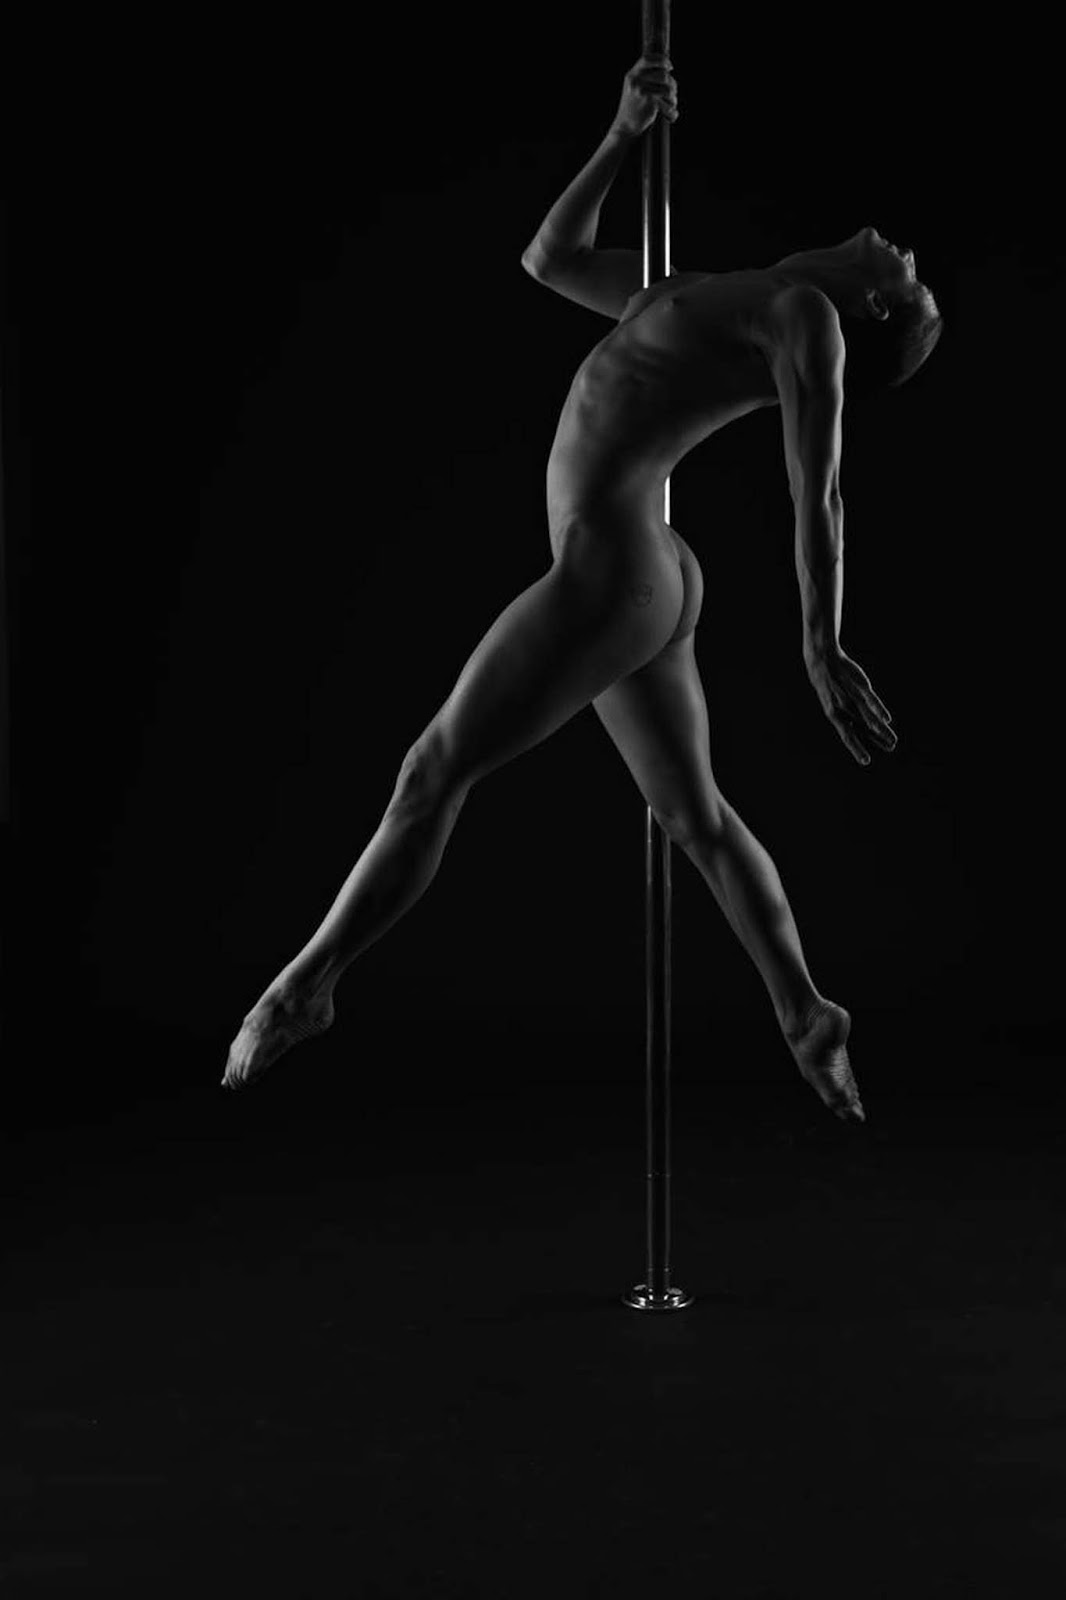 Nude Pole Dancer Xxx Images Galery